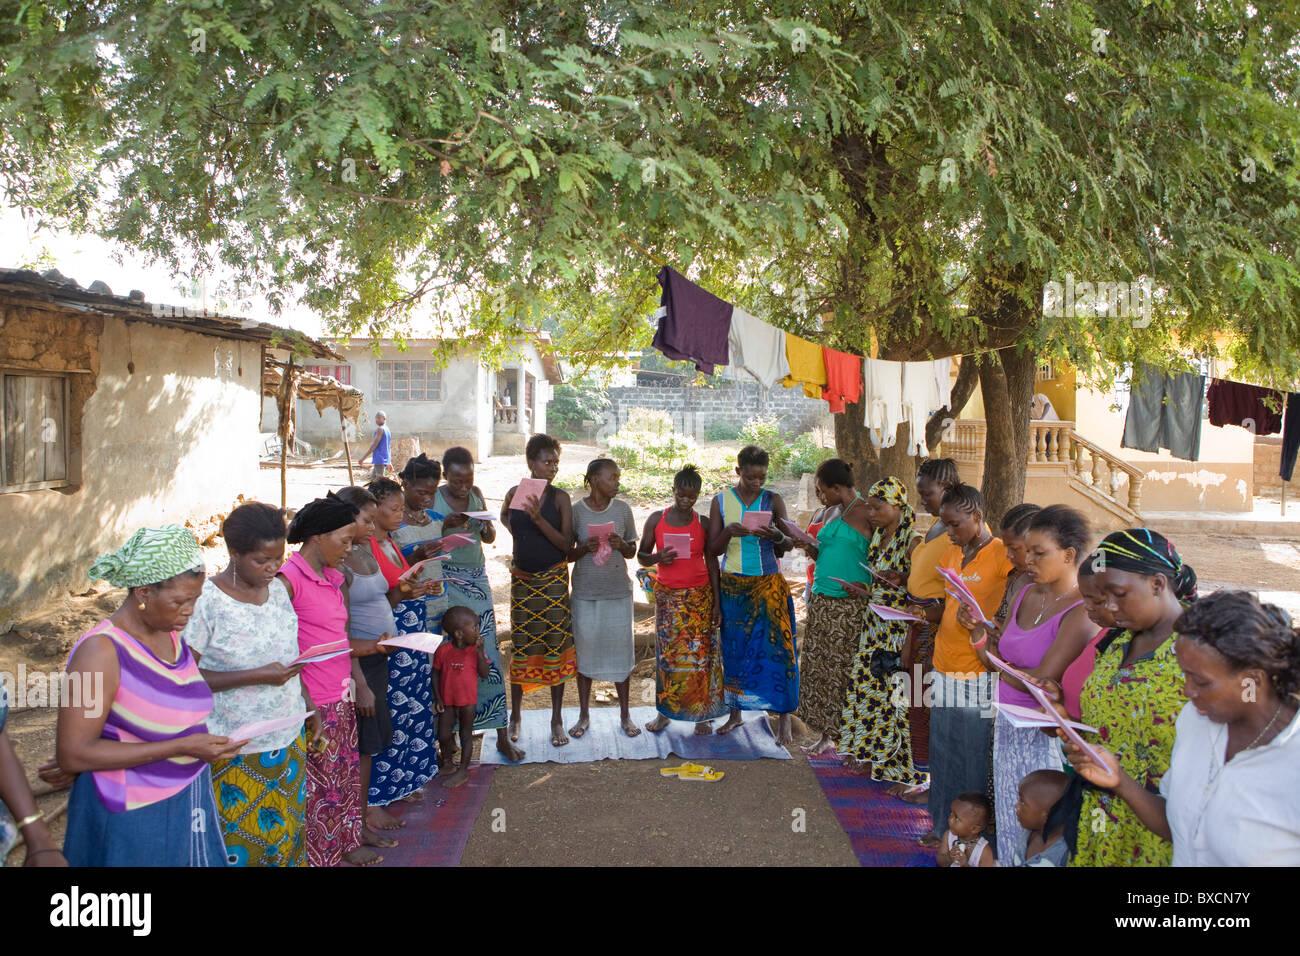 Women attend a community meeting in Freetown, Sierra Leone, West Africa. - Stock Image